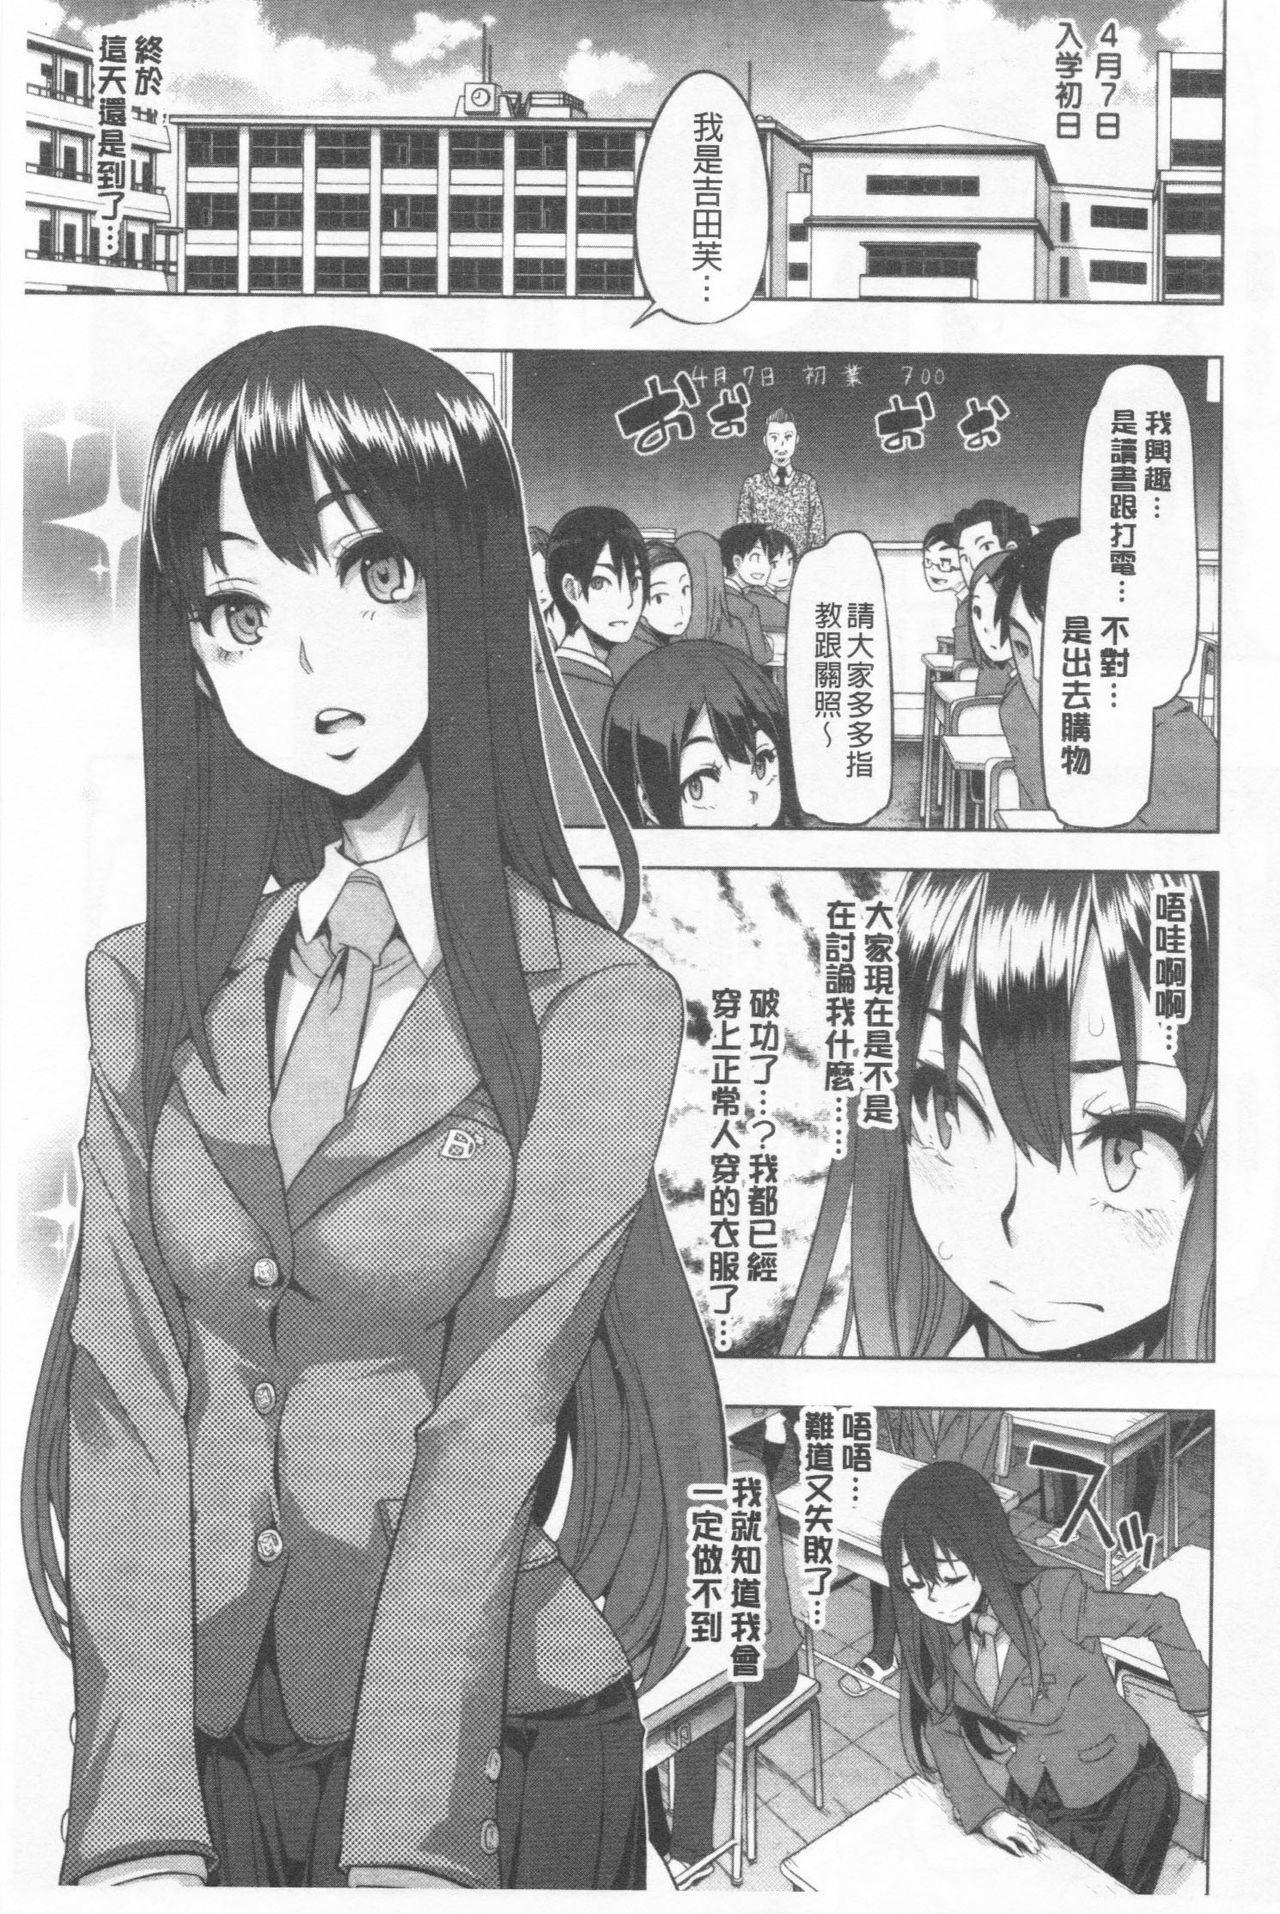 Henshin + 4P leaflet 9